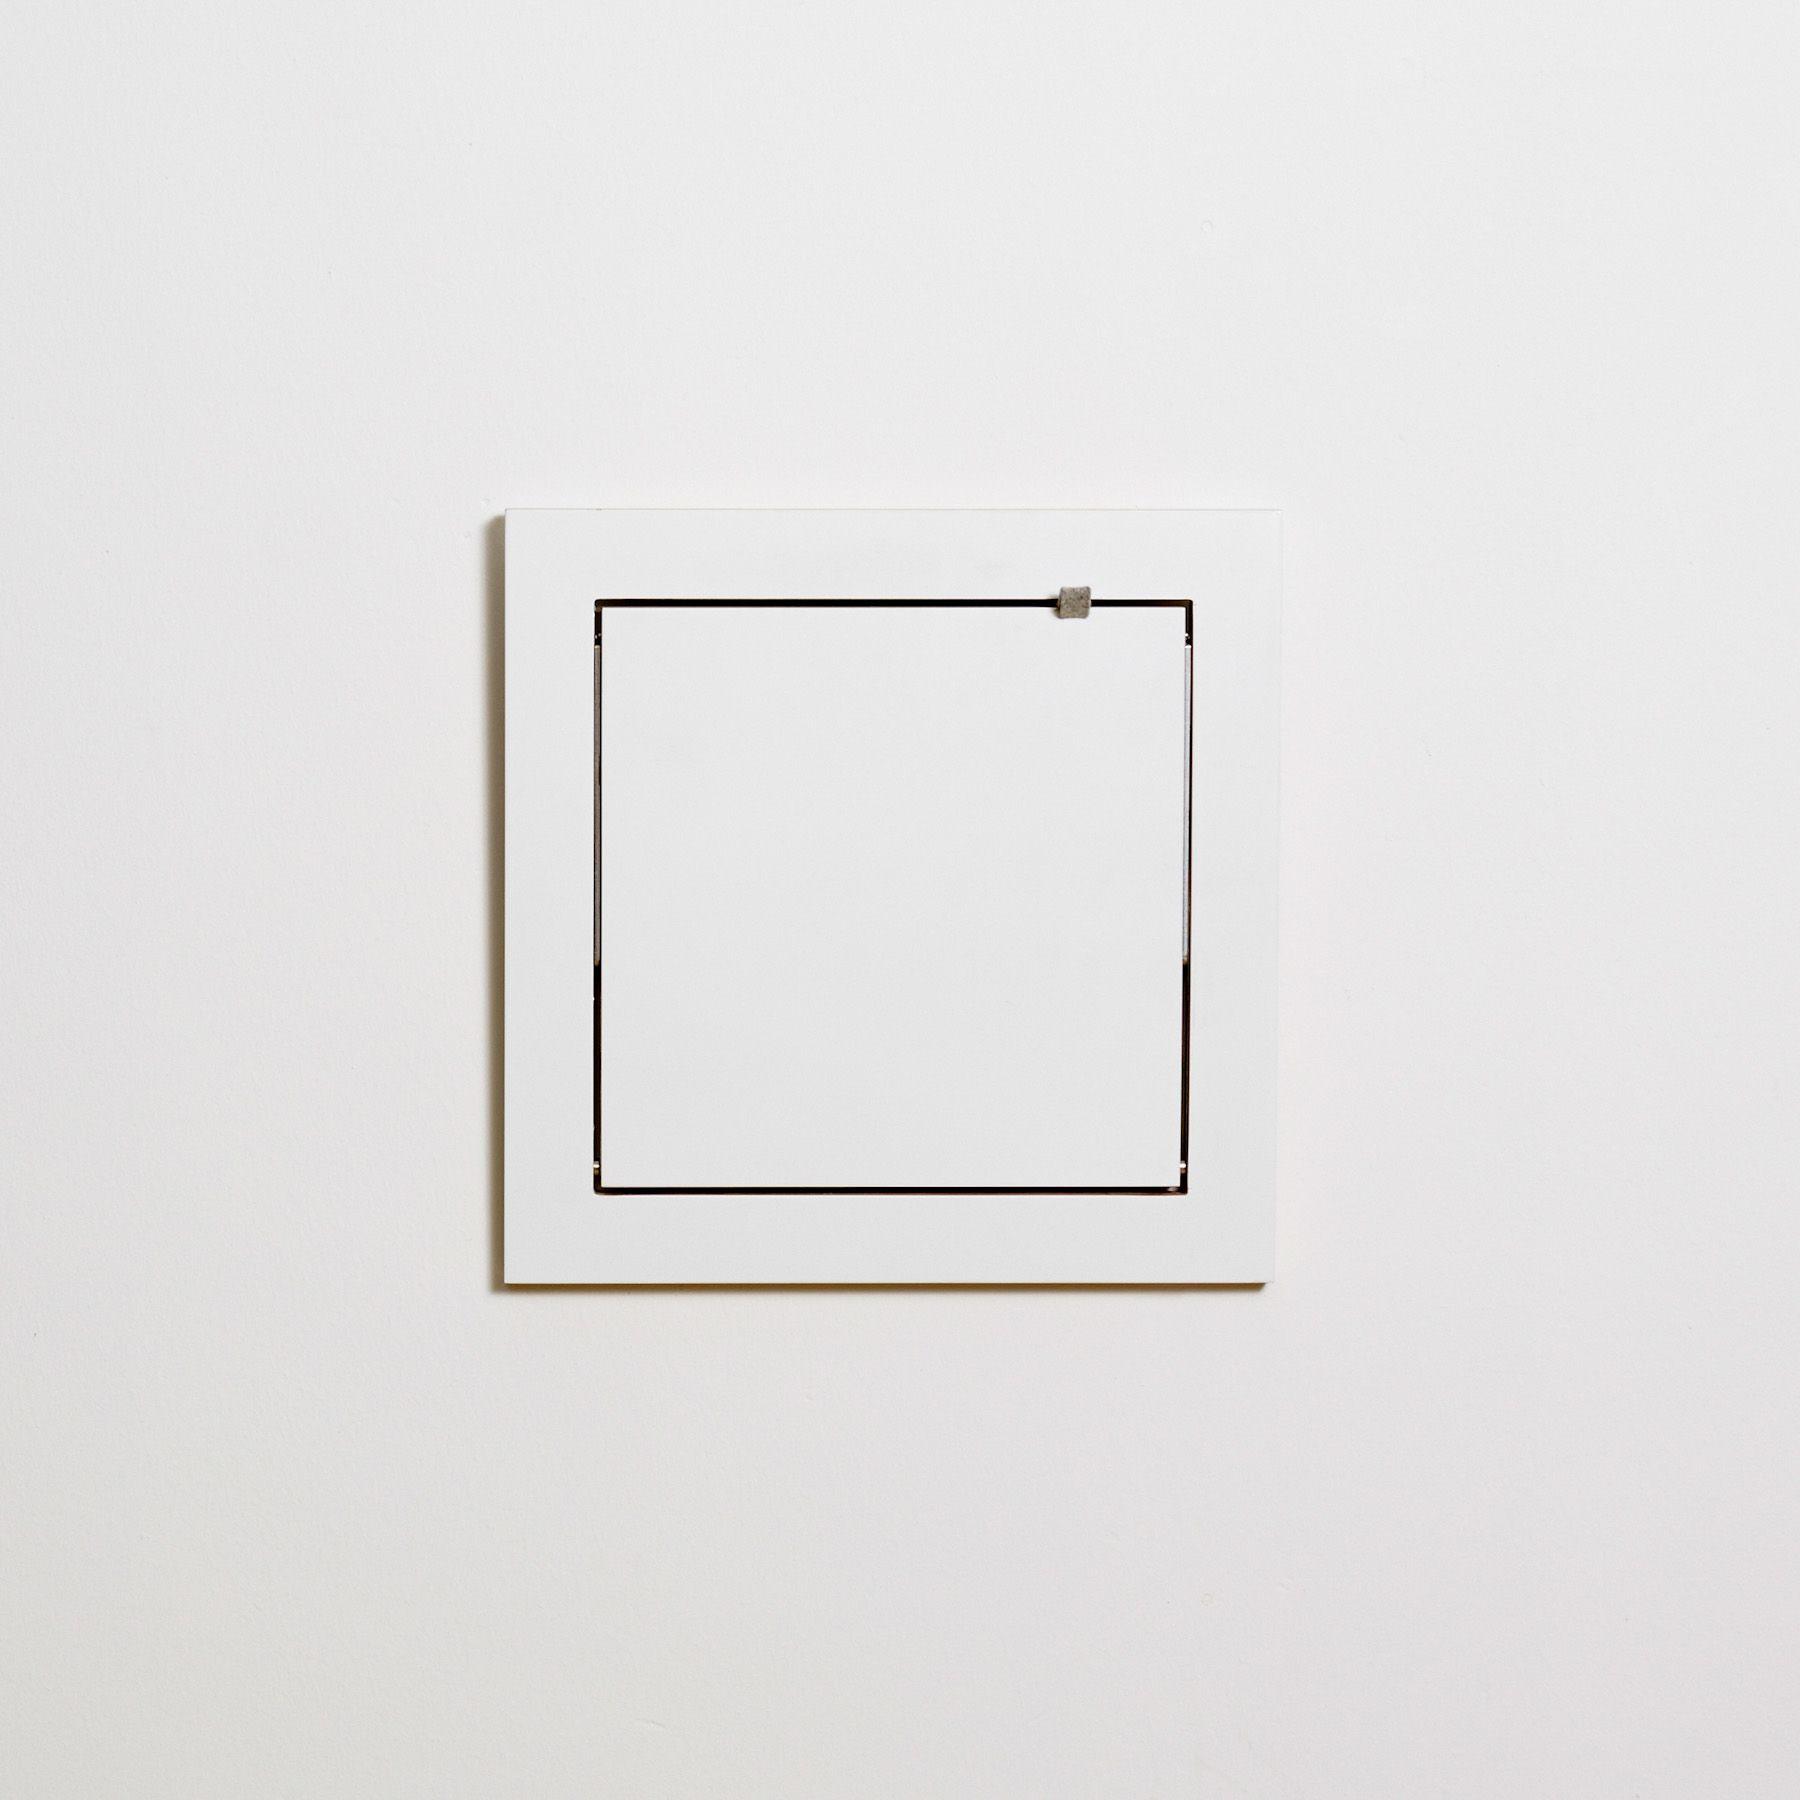 Étagère Fläpps 40 x 40 cm | Blanc